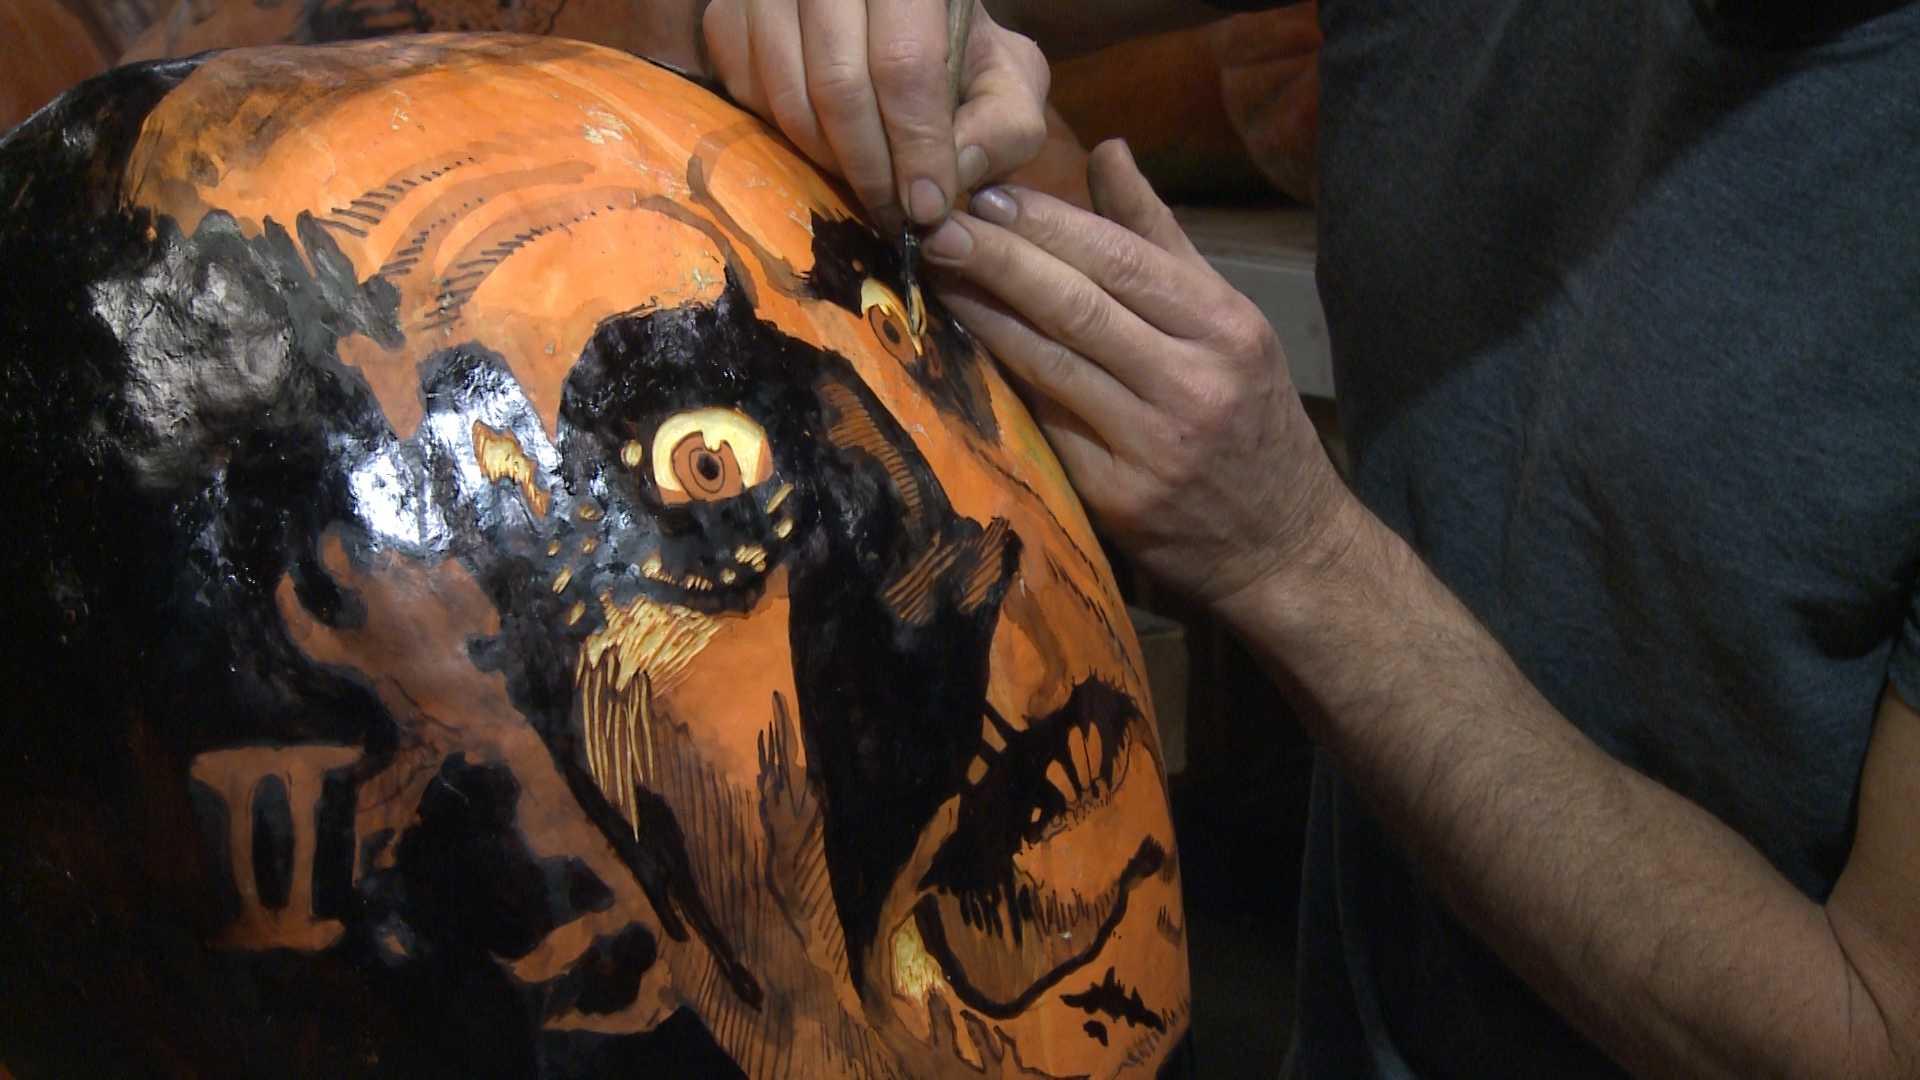 Louisville Jack O'Lantern spectacular returns to Iroquois Park